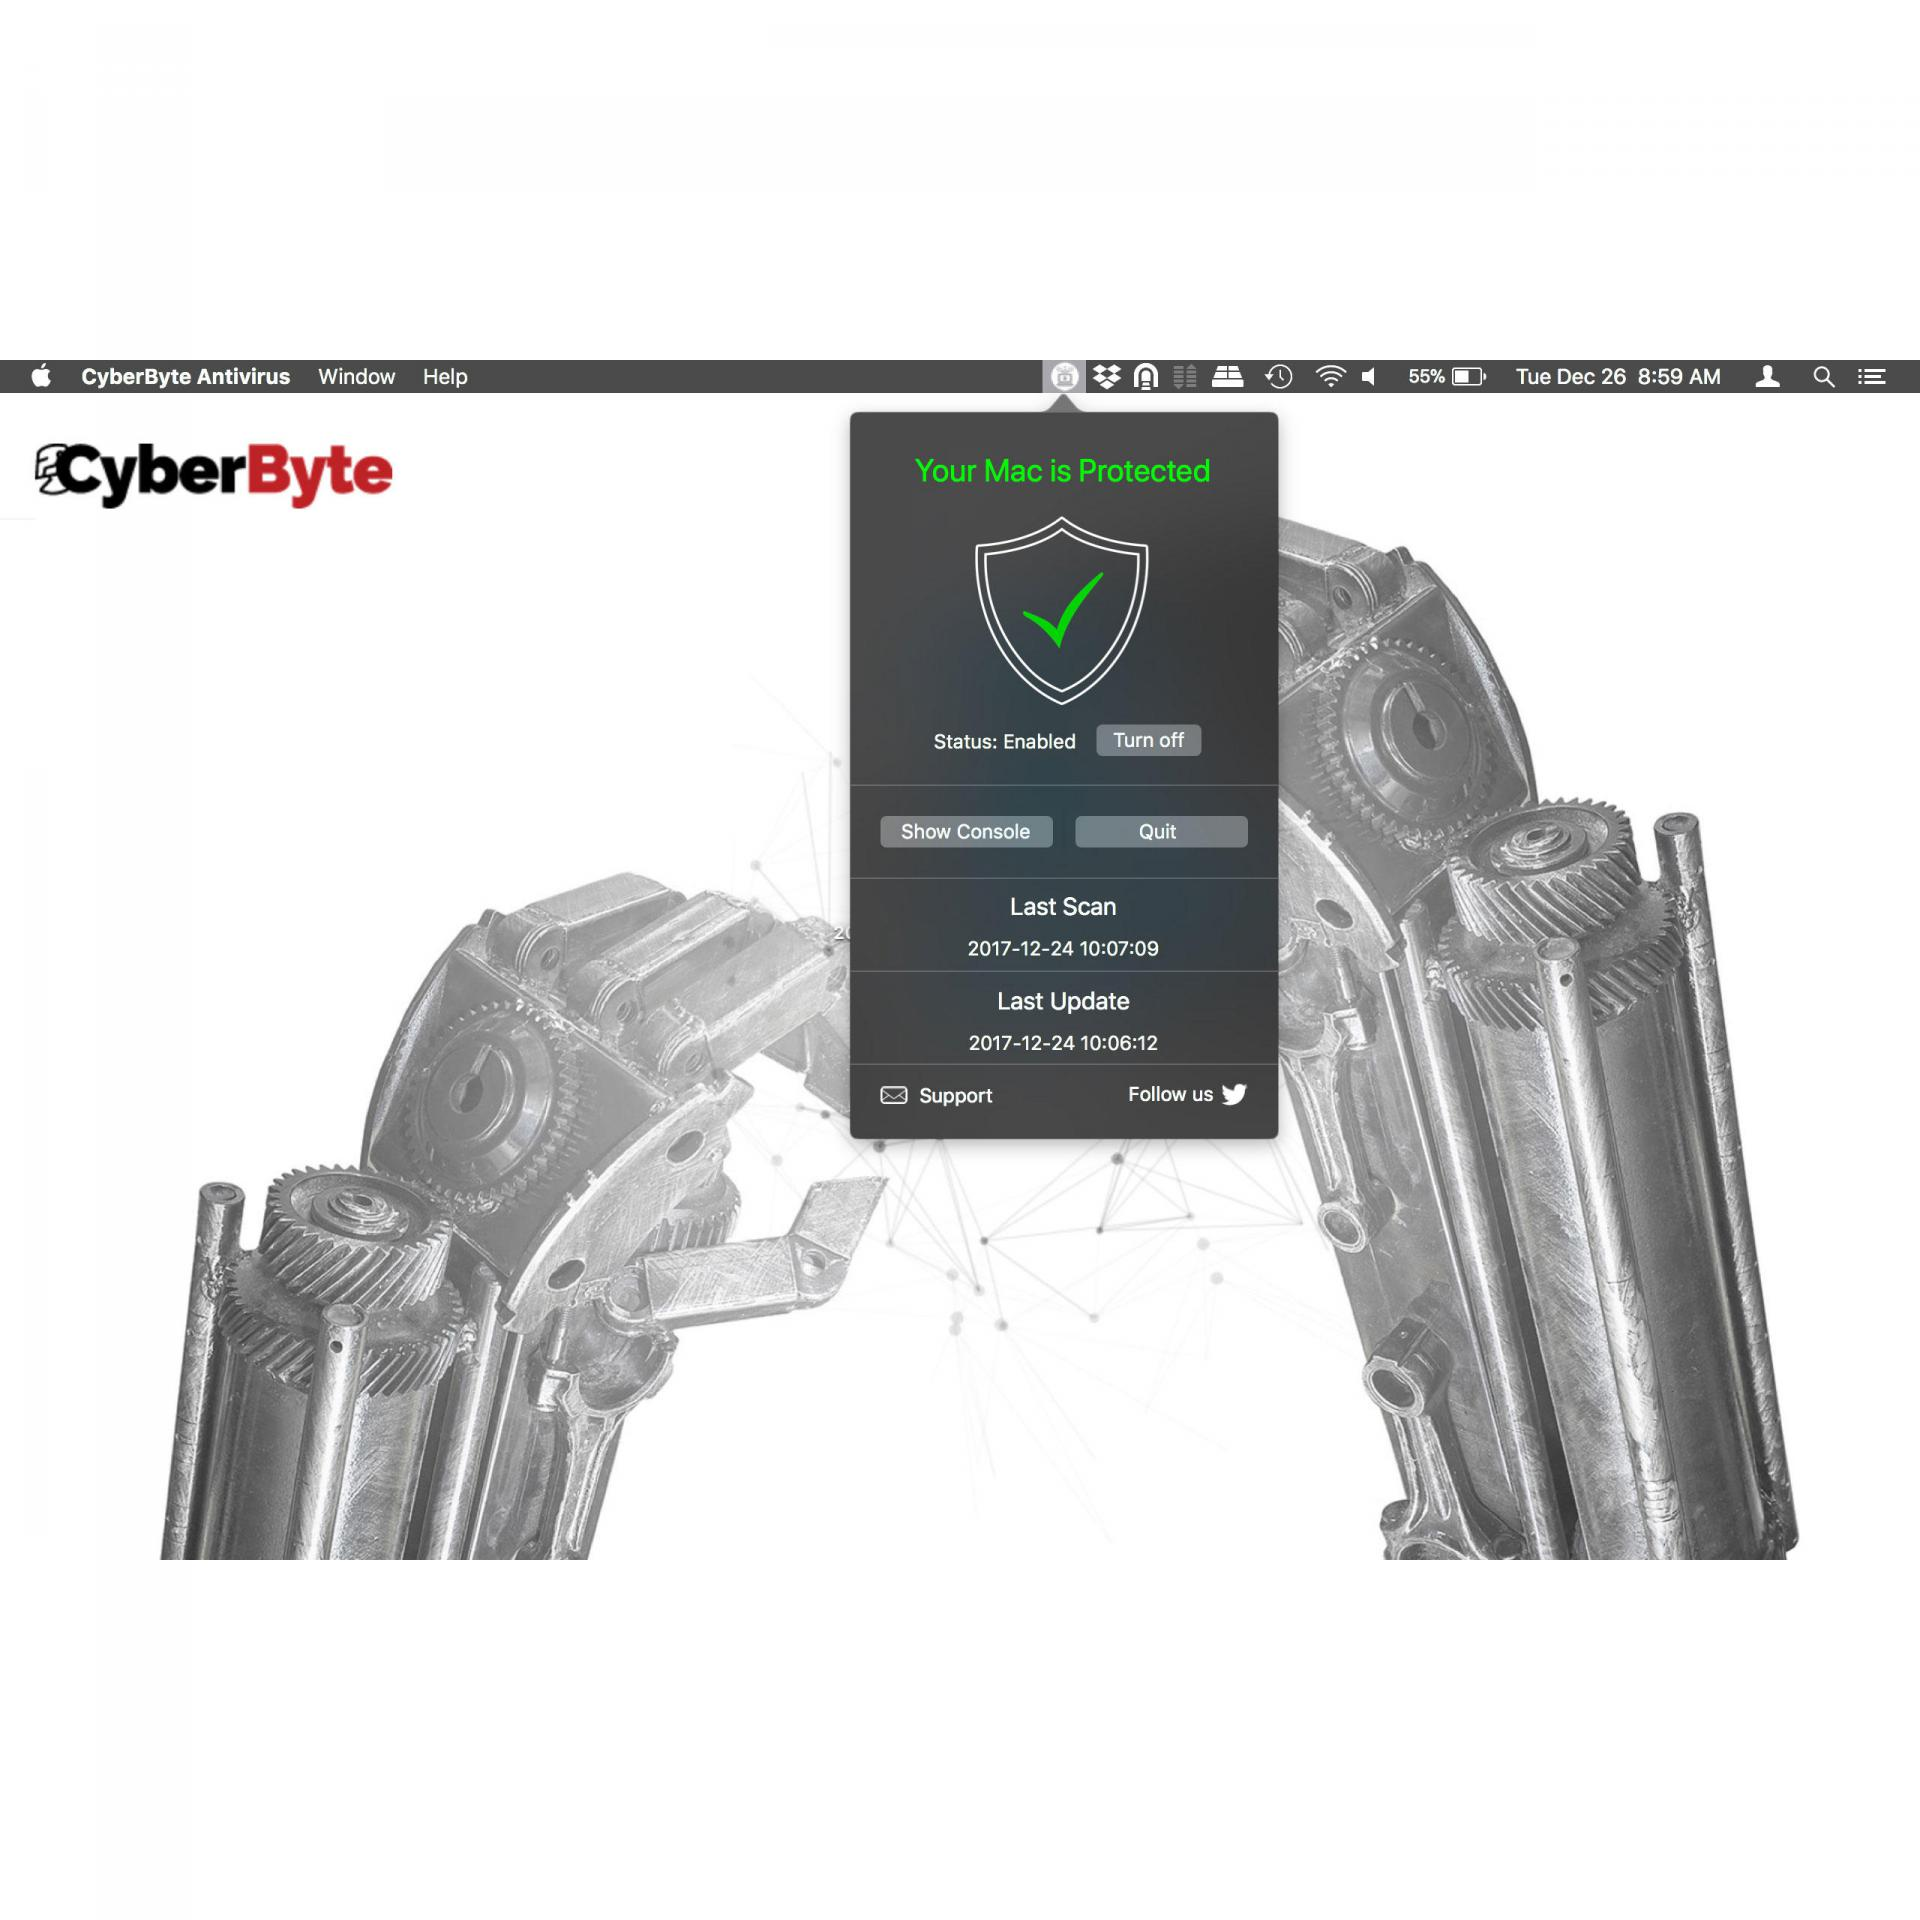 cyberbyte-antivirus_1_329780.jpg